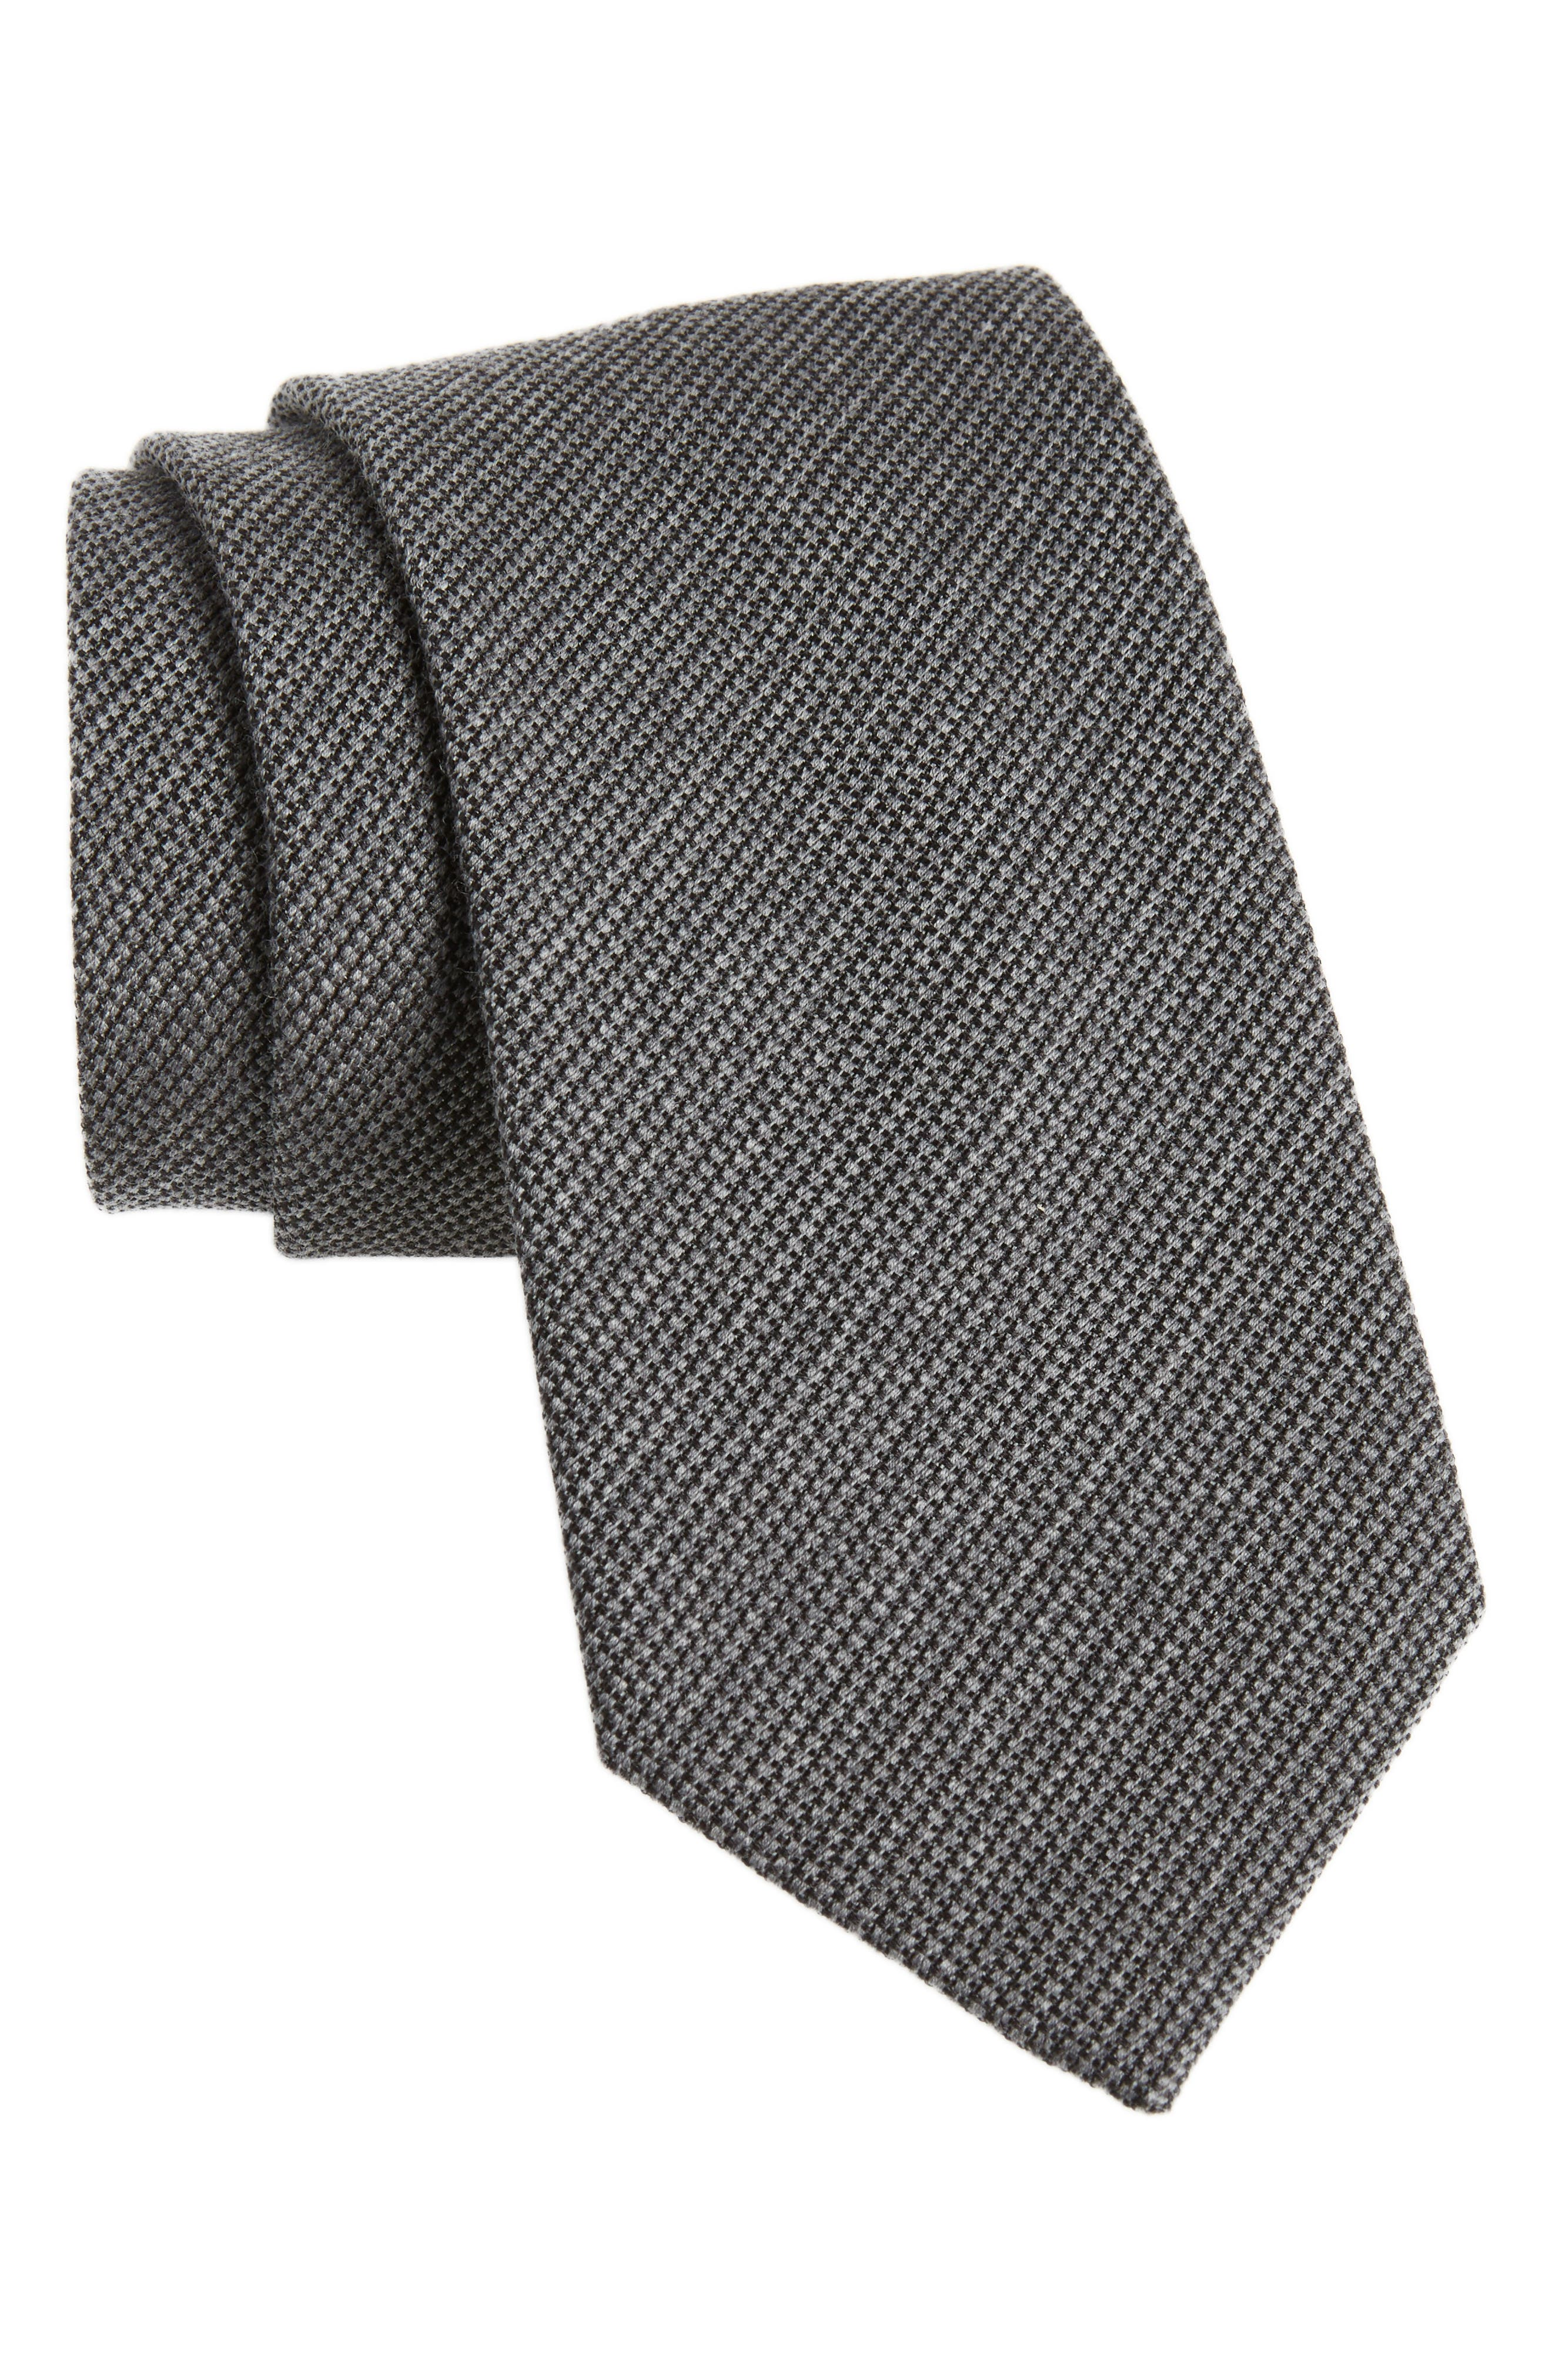 Main Image - Brioni Wool & Silk Tie